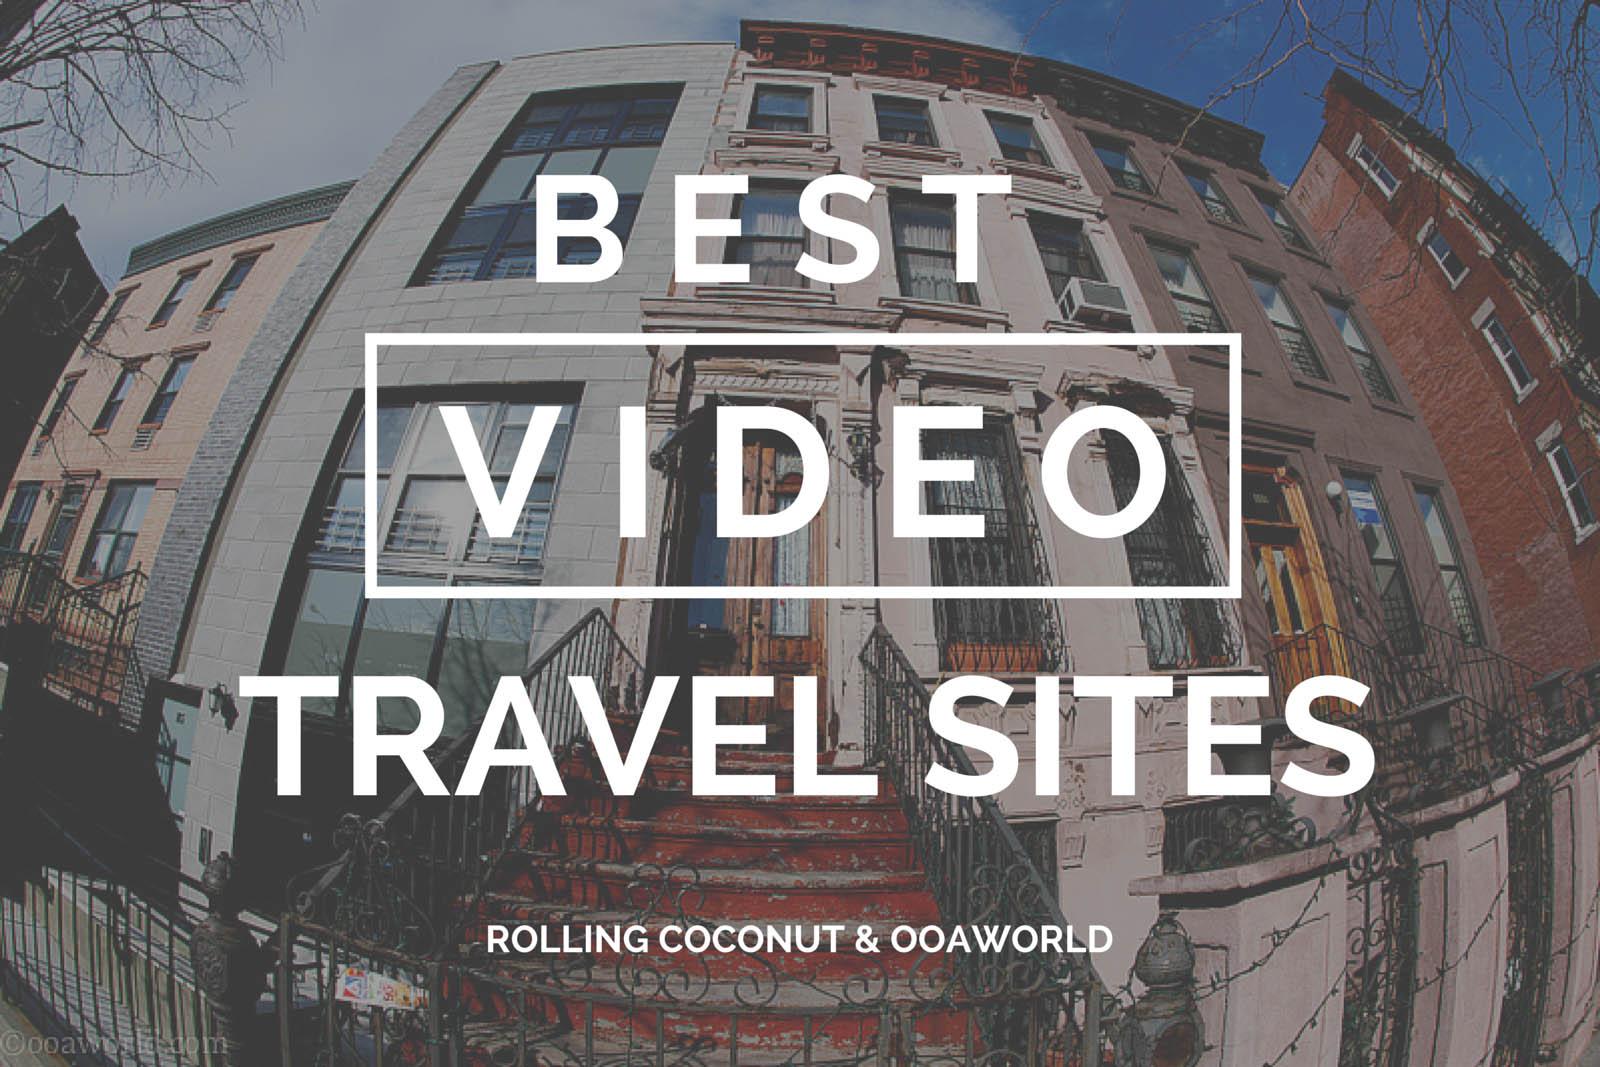 Best Travel Video Sites OOAworld Photo Ooaworld